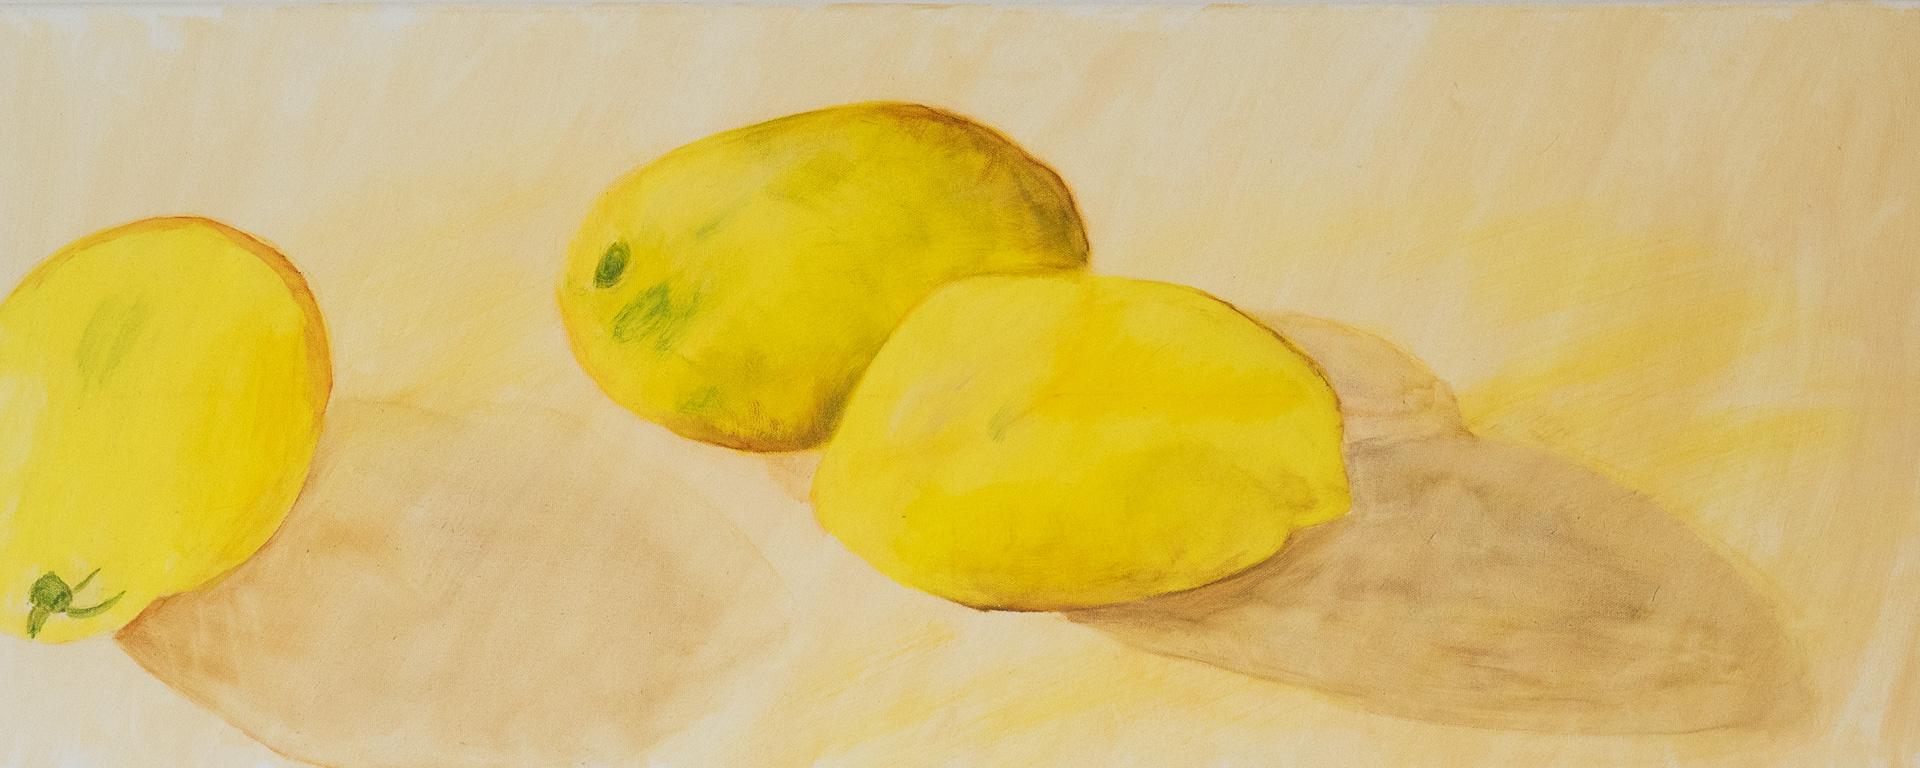 Zitronen - Acryl auf Leinwand 40 100